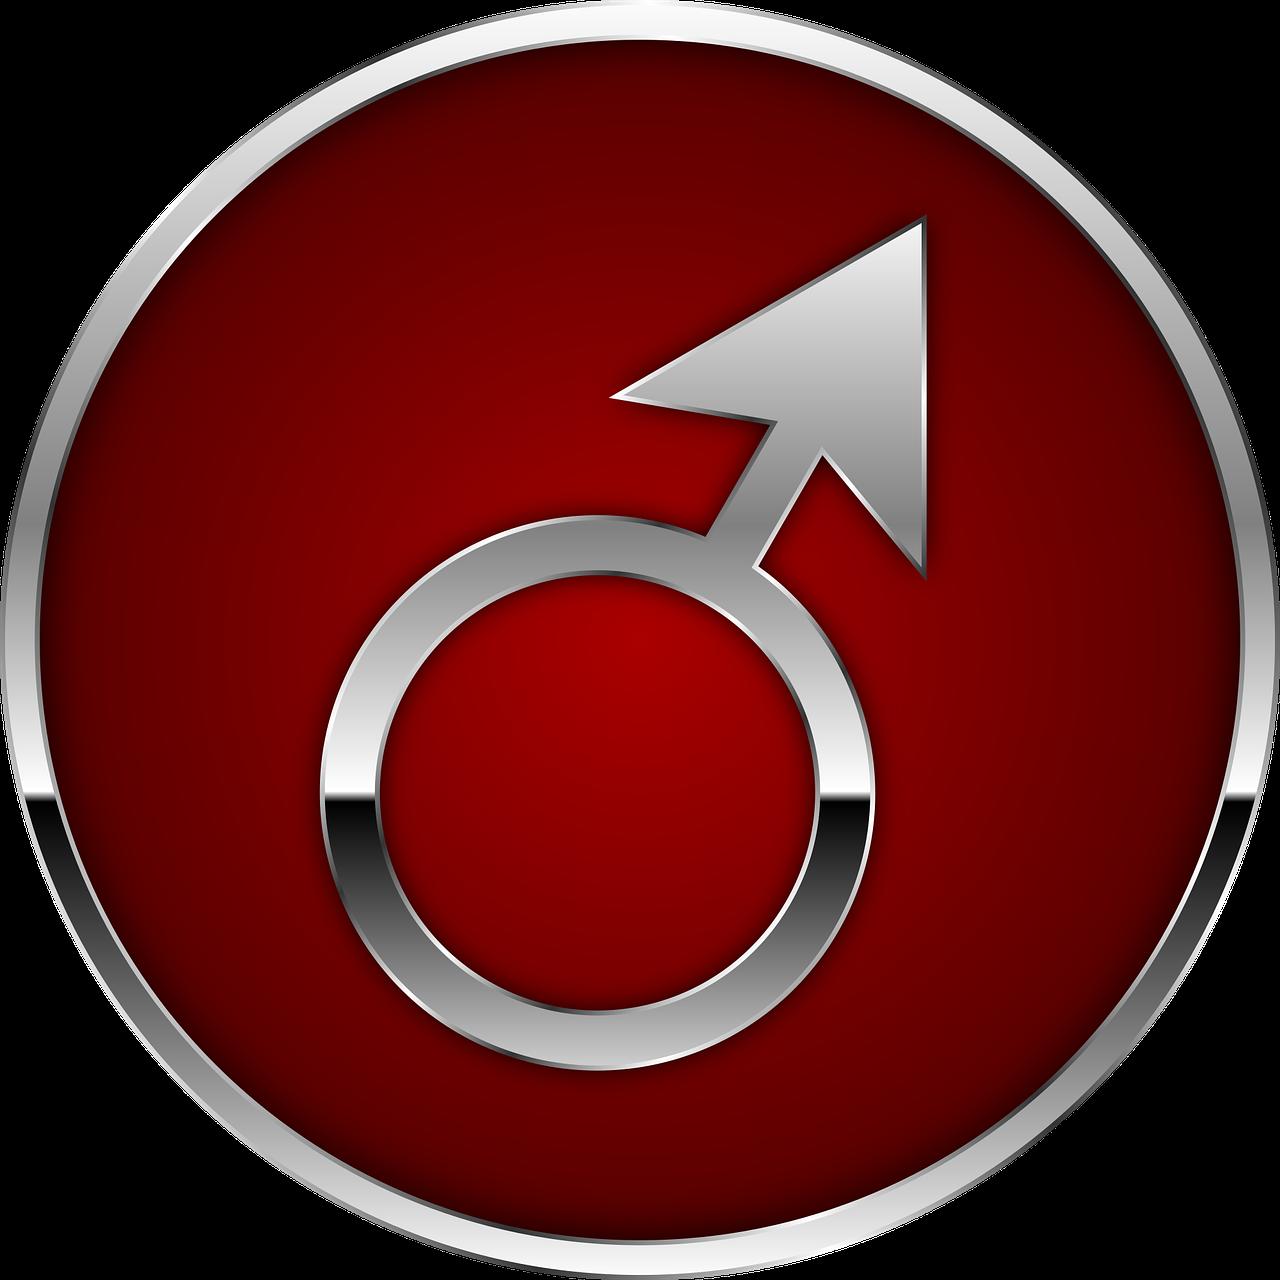 mars zodiac sign